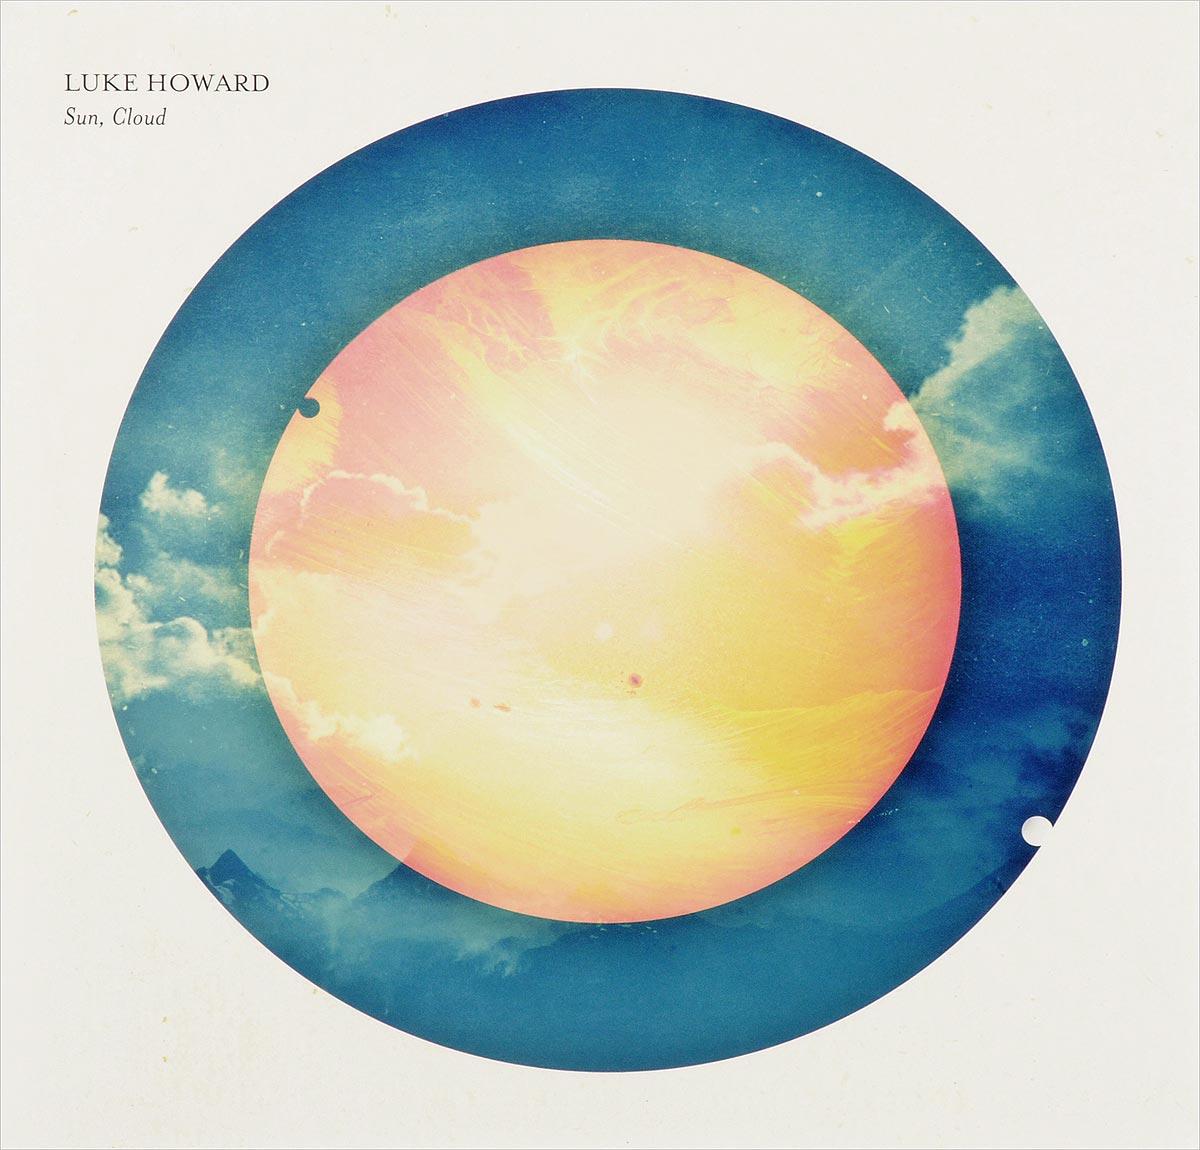 Luke Howard. Sun, Cloud (LP)